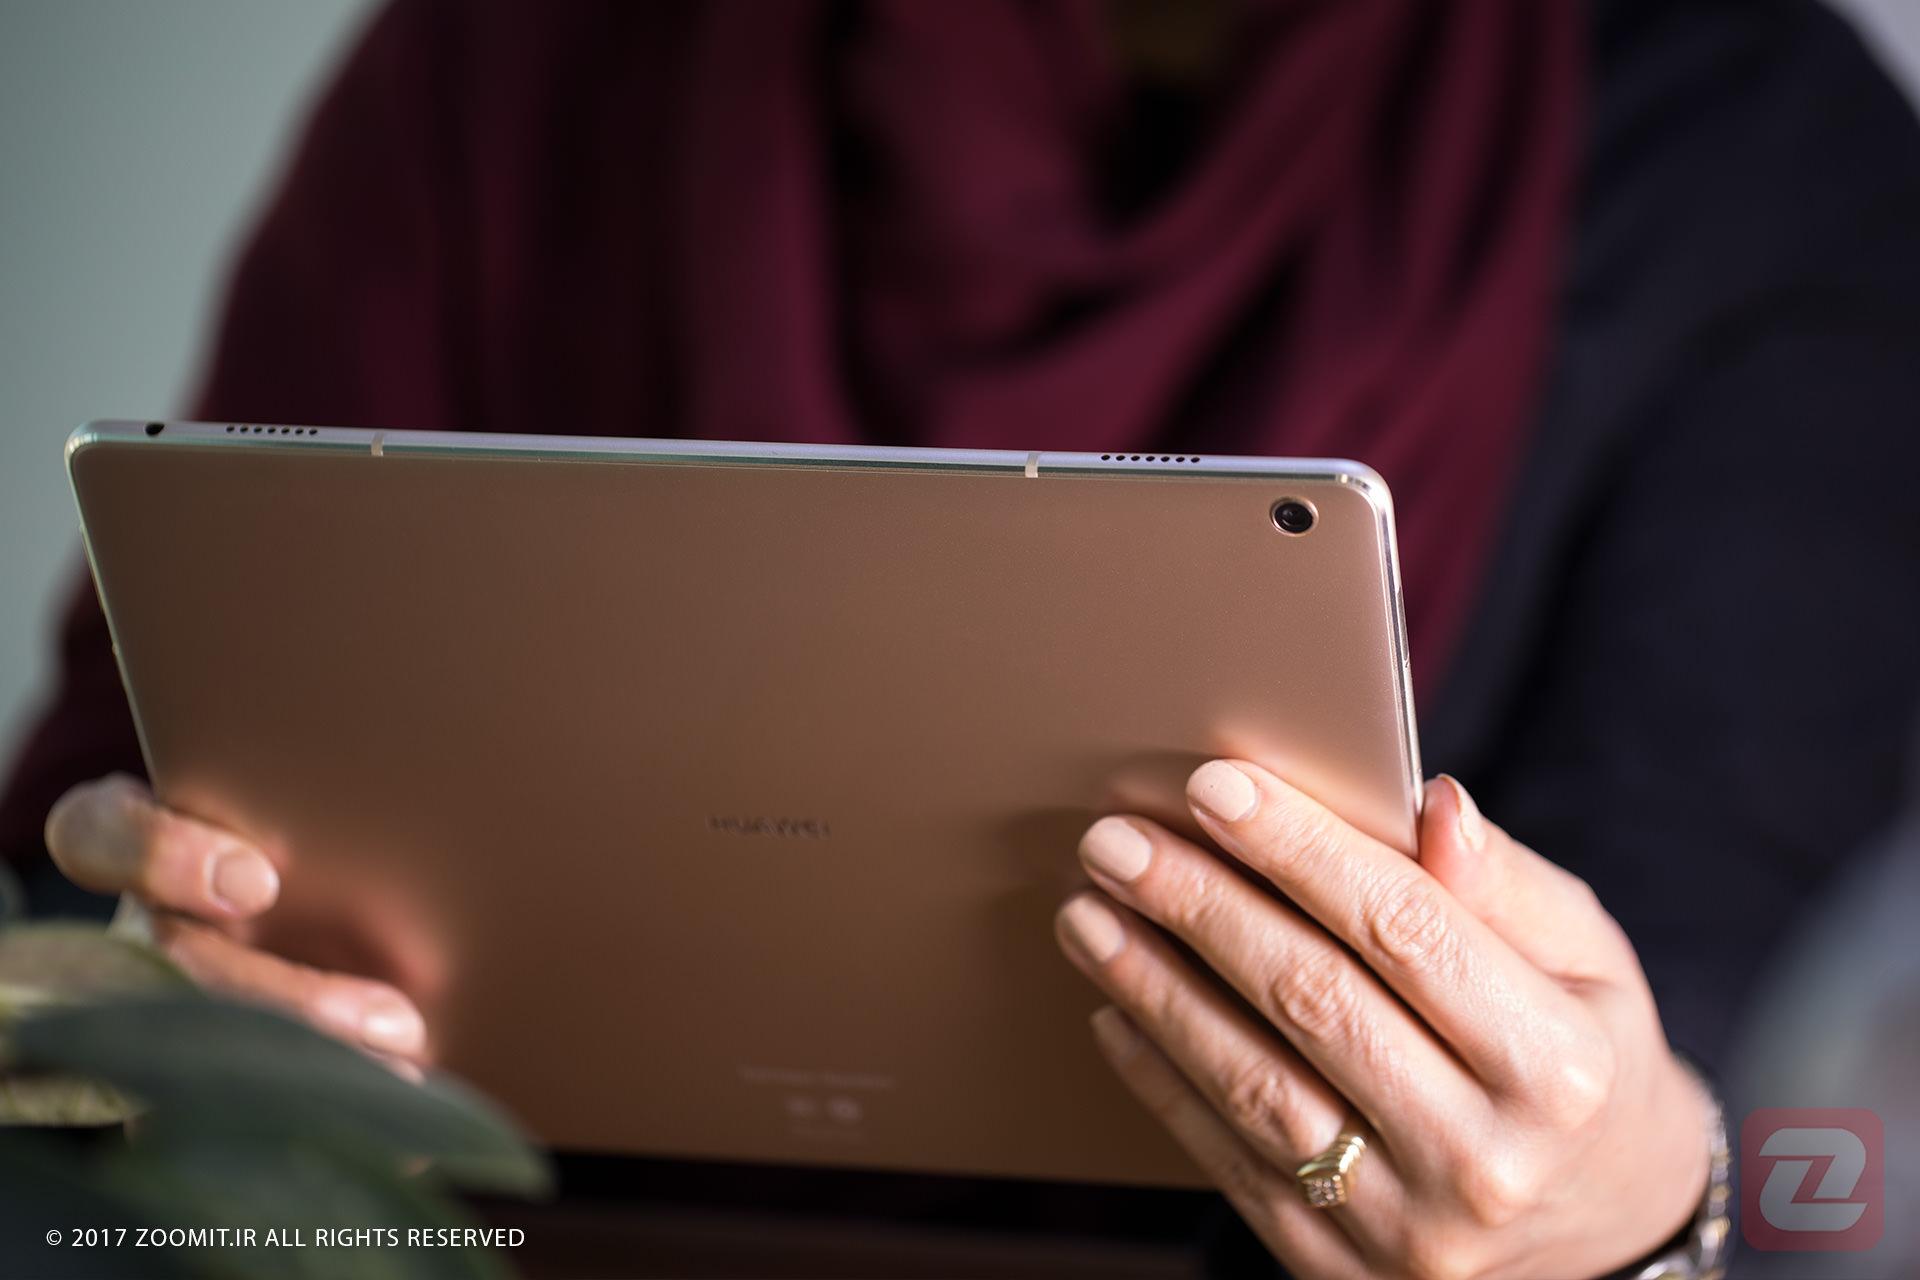 هواوی مدیاپد ام ۳ لایت ۱۰ / Huawei Mediapad M3 lite 10